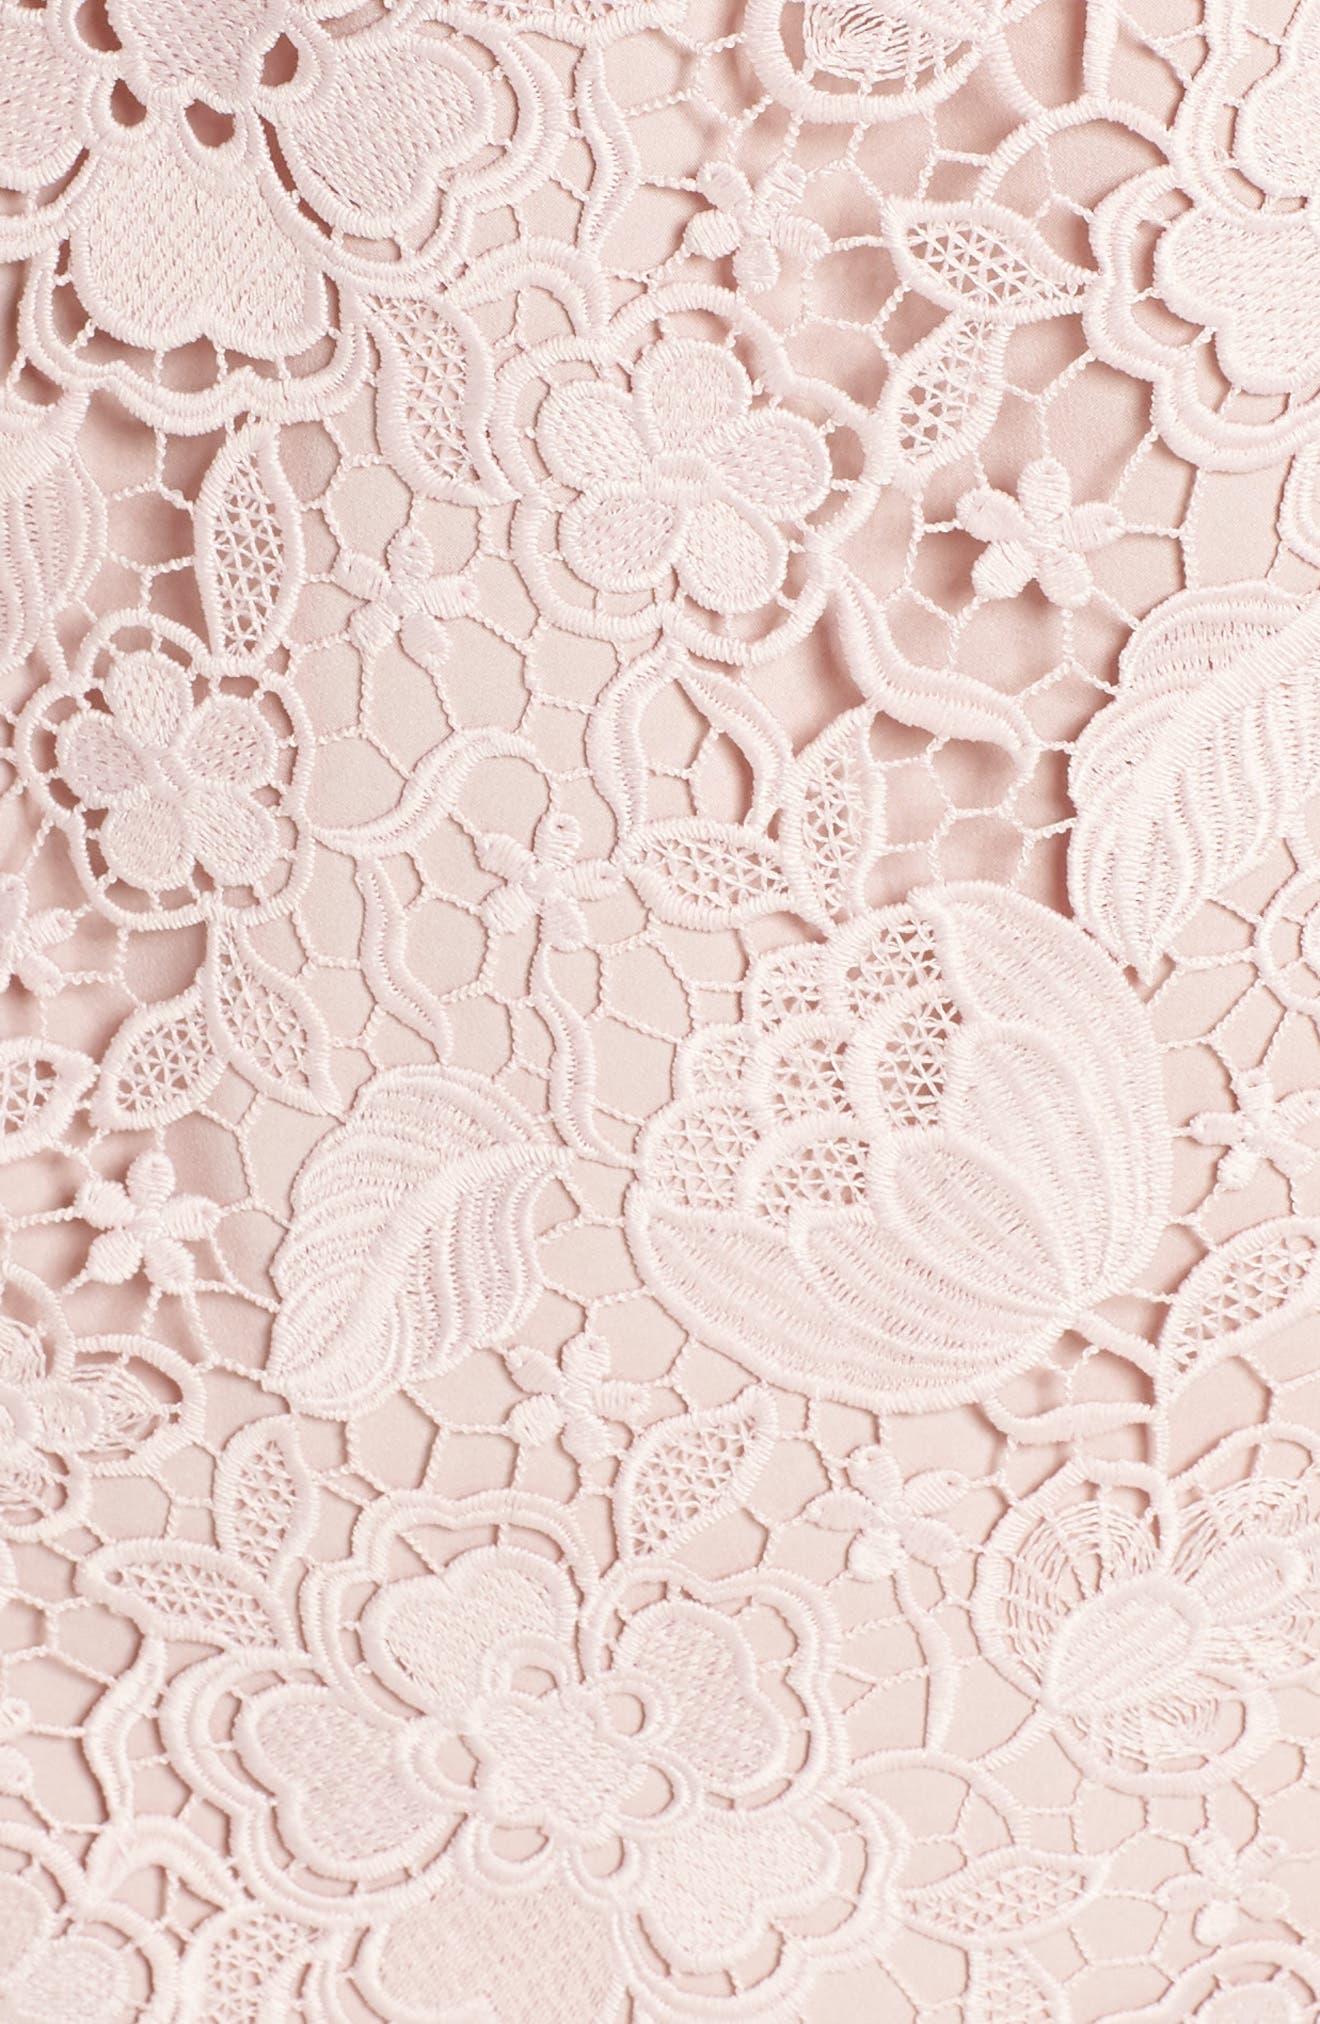 ELIZA J, Embroidered Lace Sheath Dress, Alternate thumbnail 6, color, NUDE